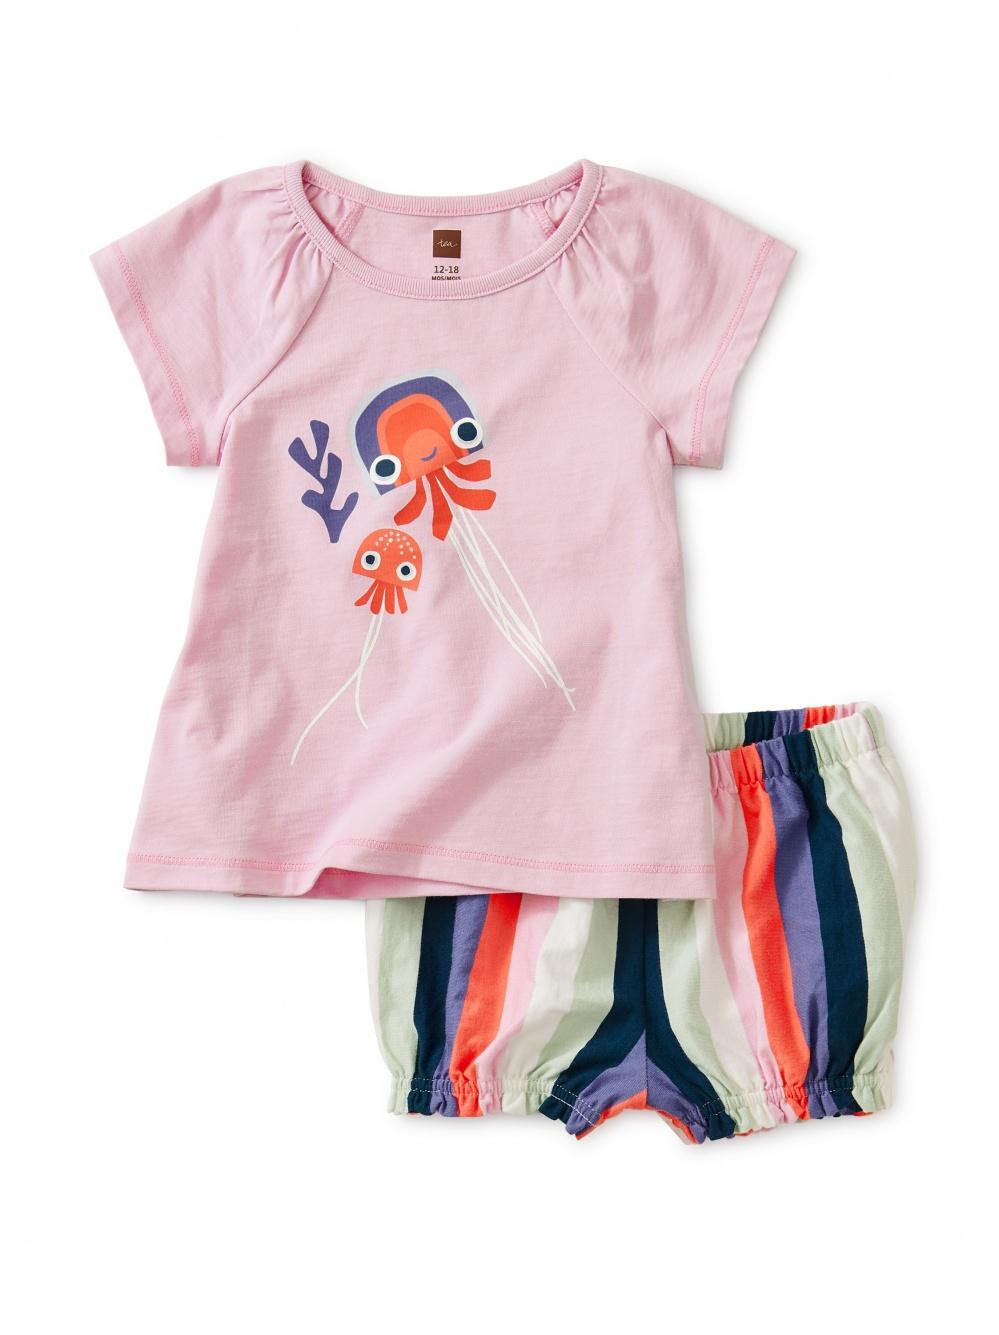 Jellyfish Baby Set